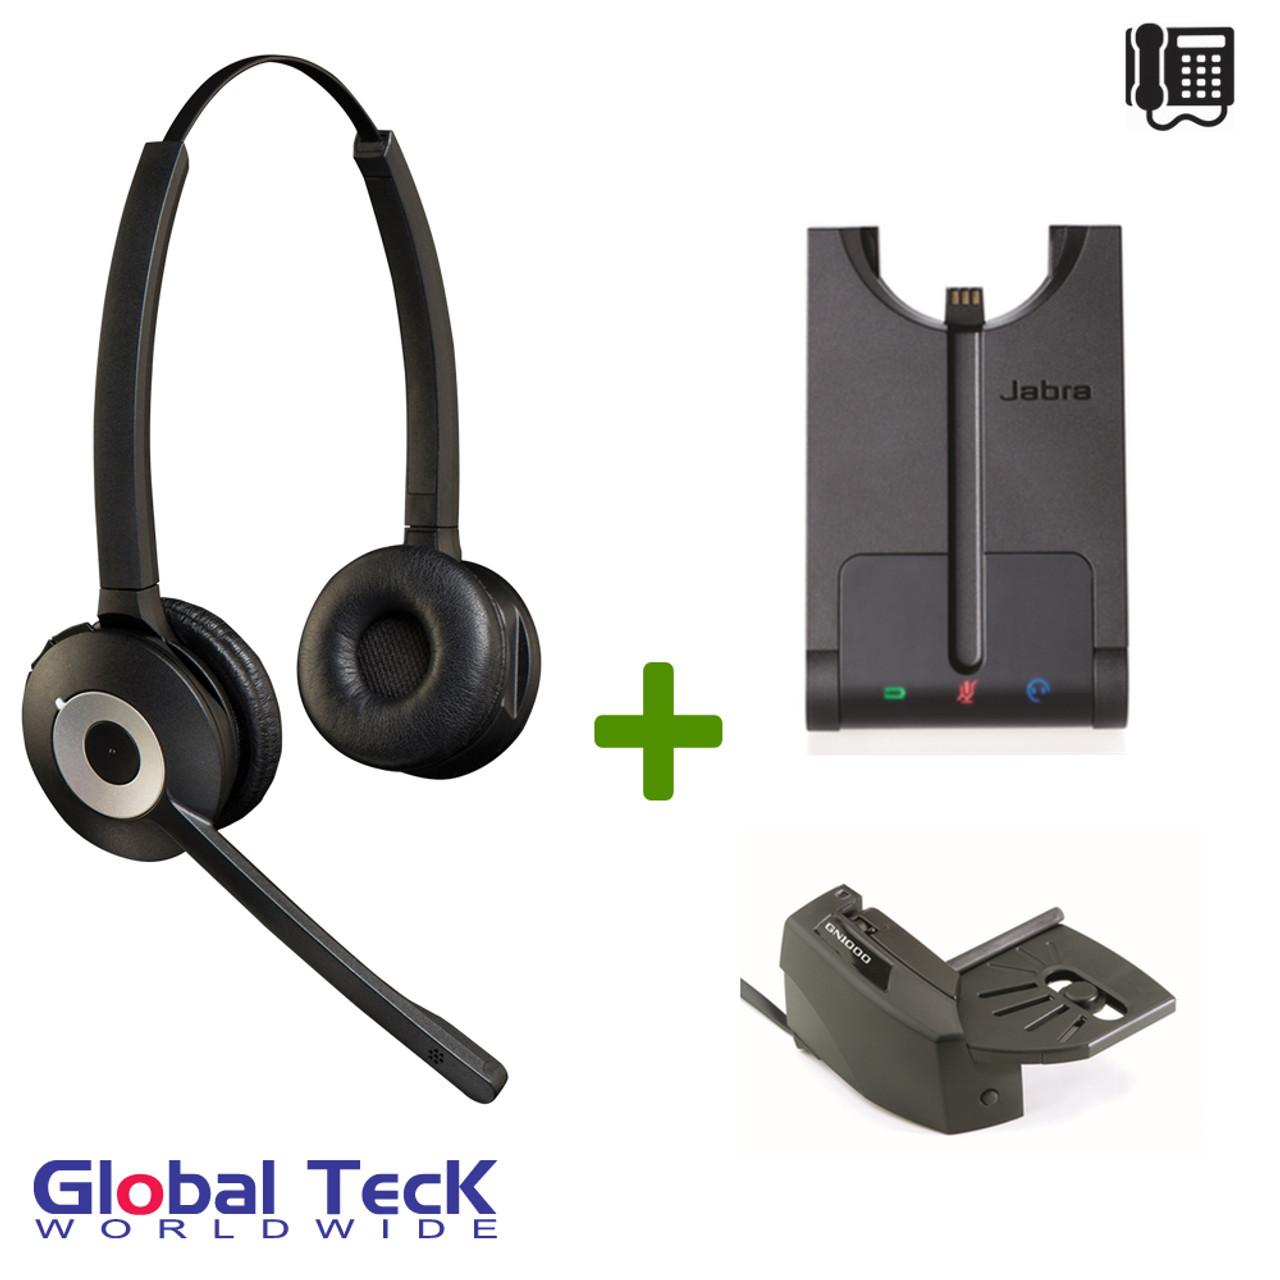 Jabra Pro Duo 920 Bundle Wireless Headset System 920 69 508 105